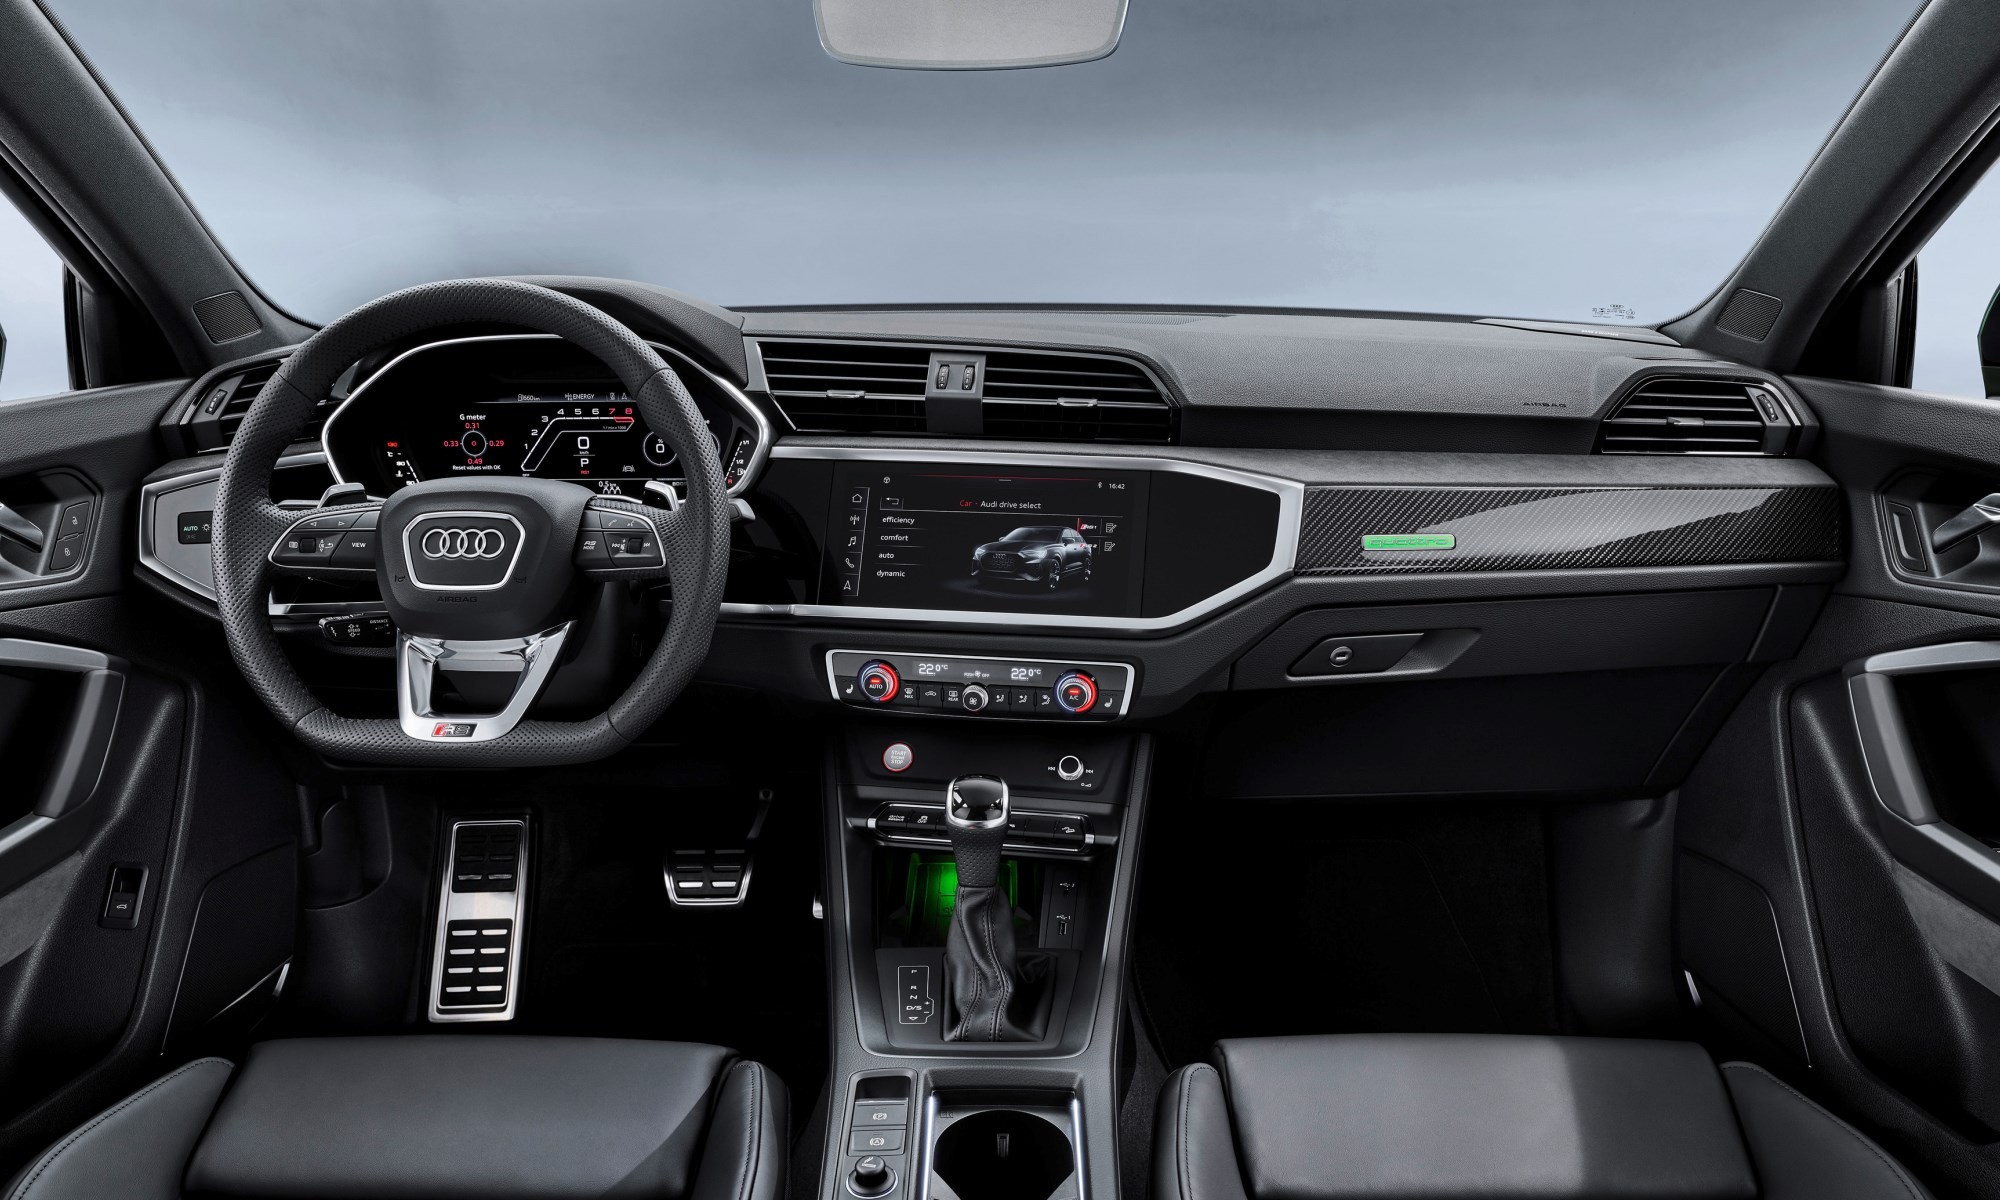 Audi RS Q3 cabin